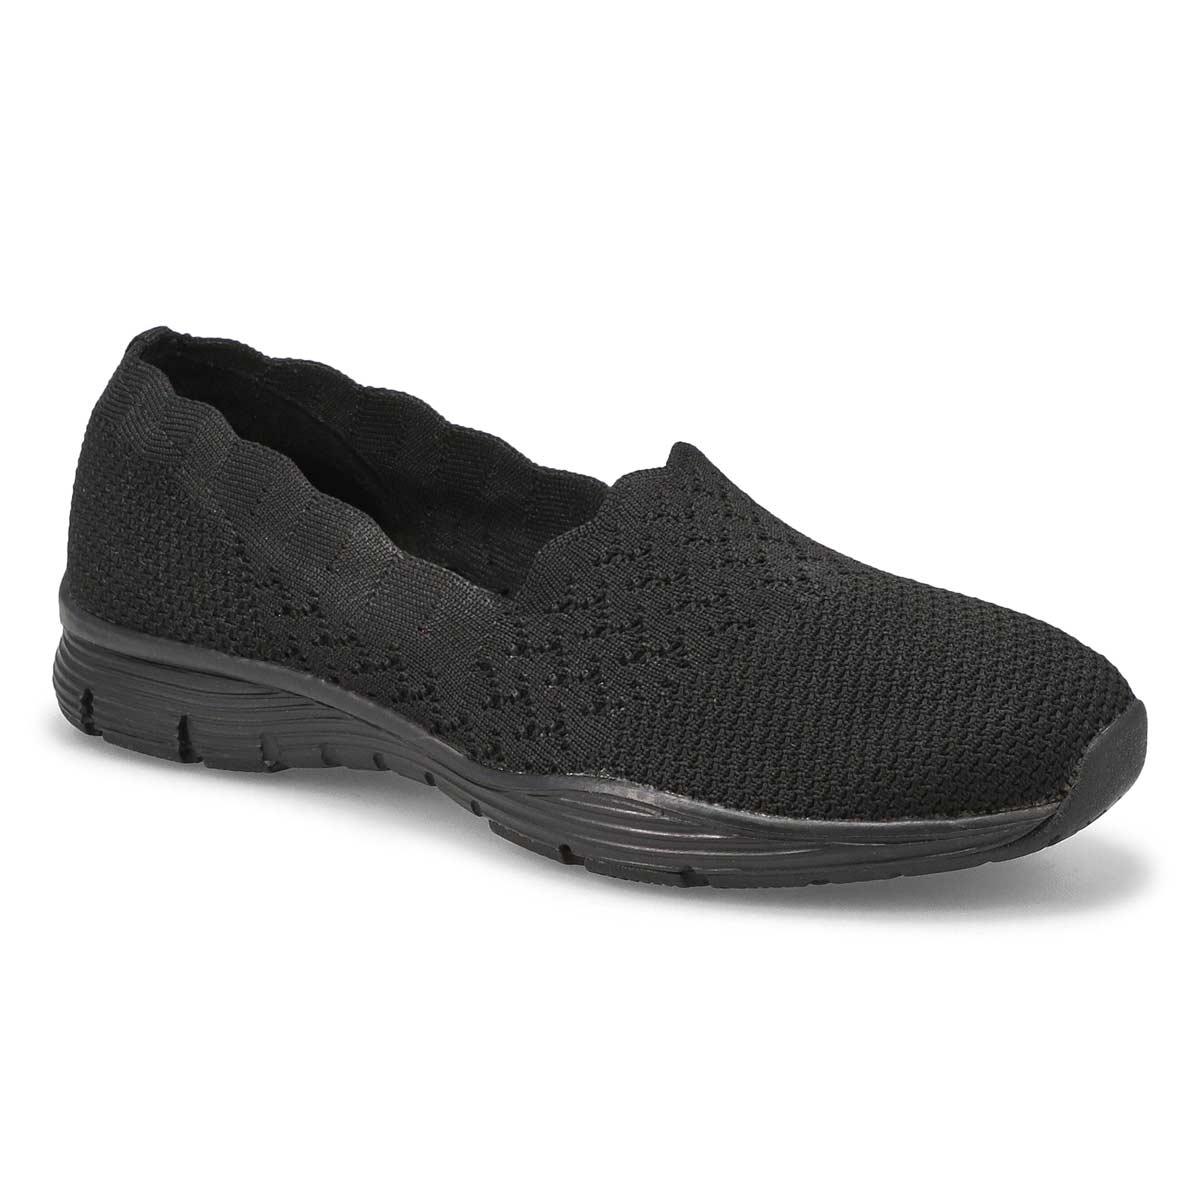 Women's Seager Stat Shoe - Black/Black